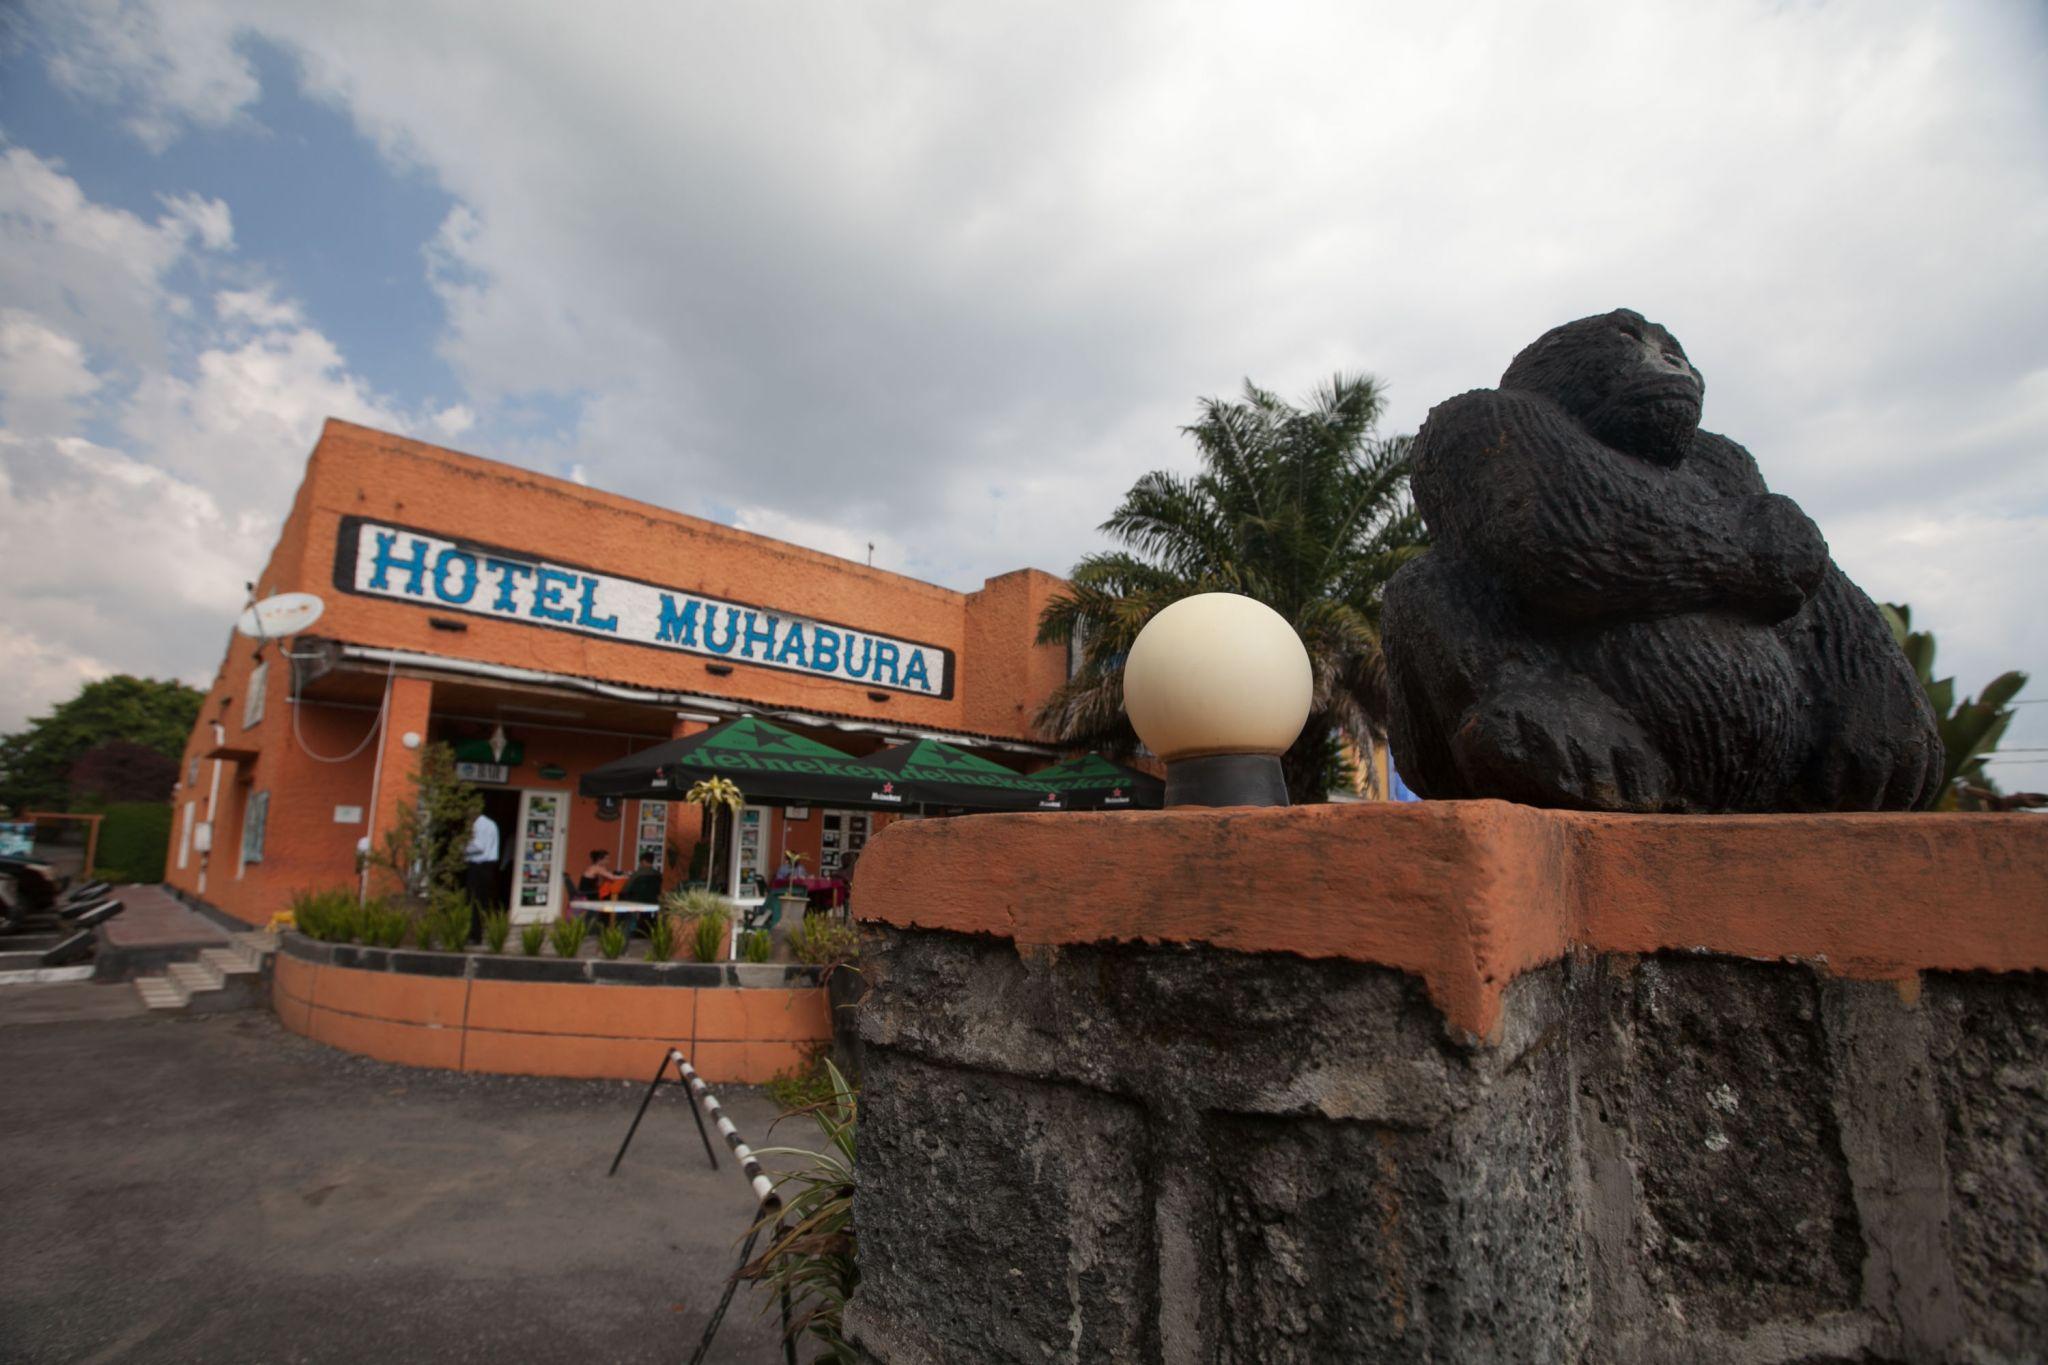 Rwanda Famous Hotel Muhabura, Rwanda